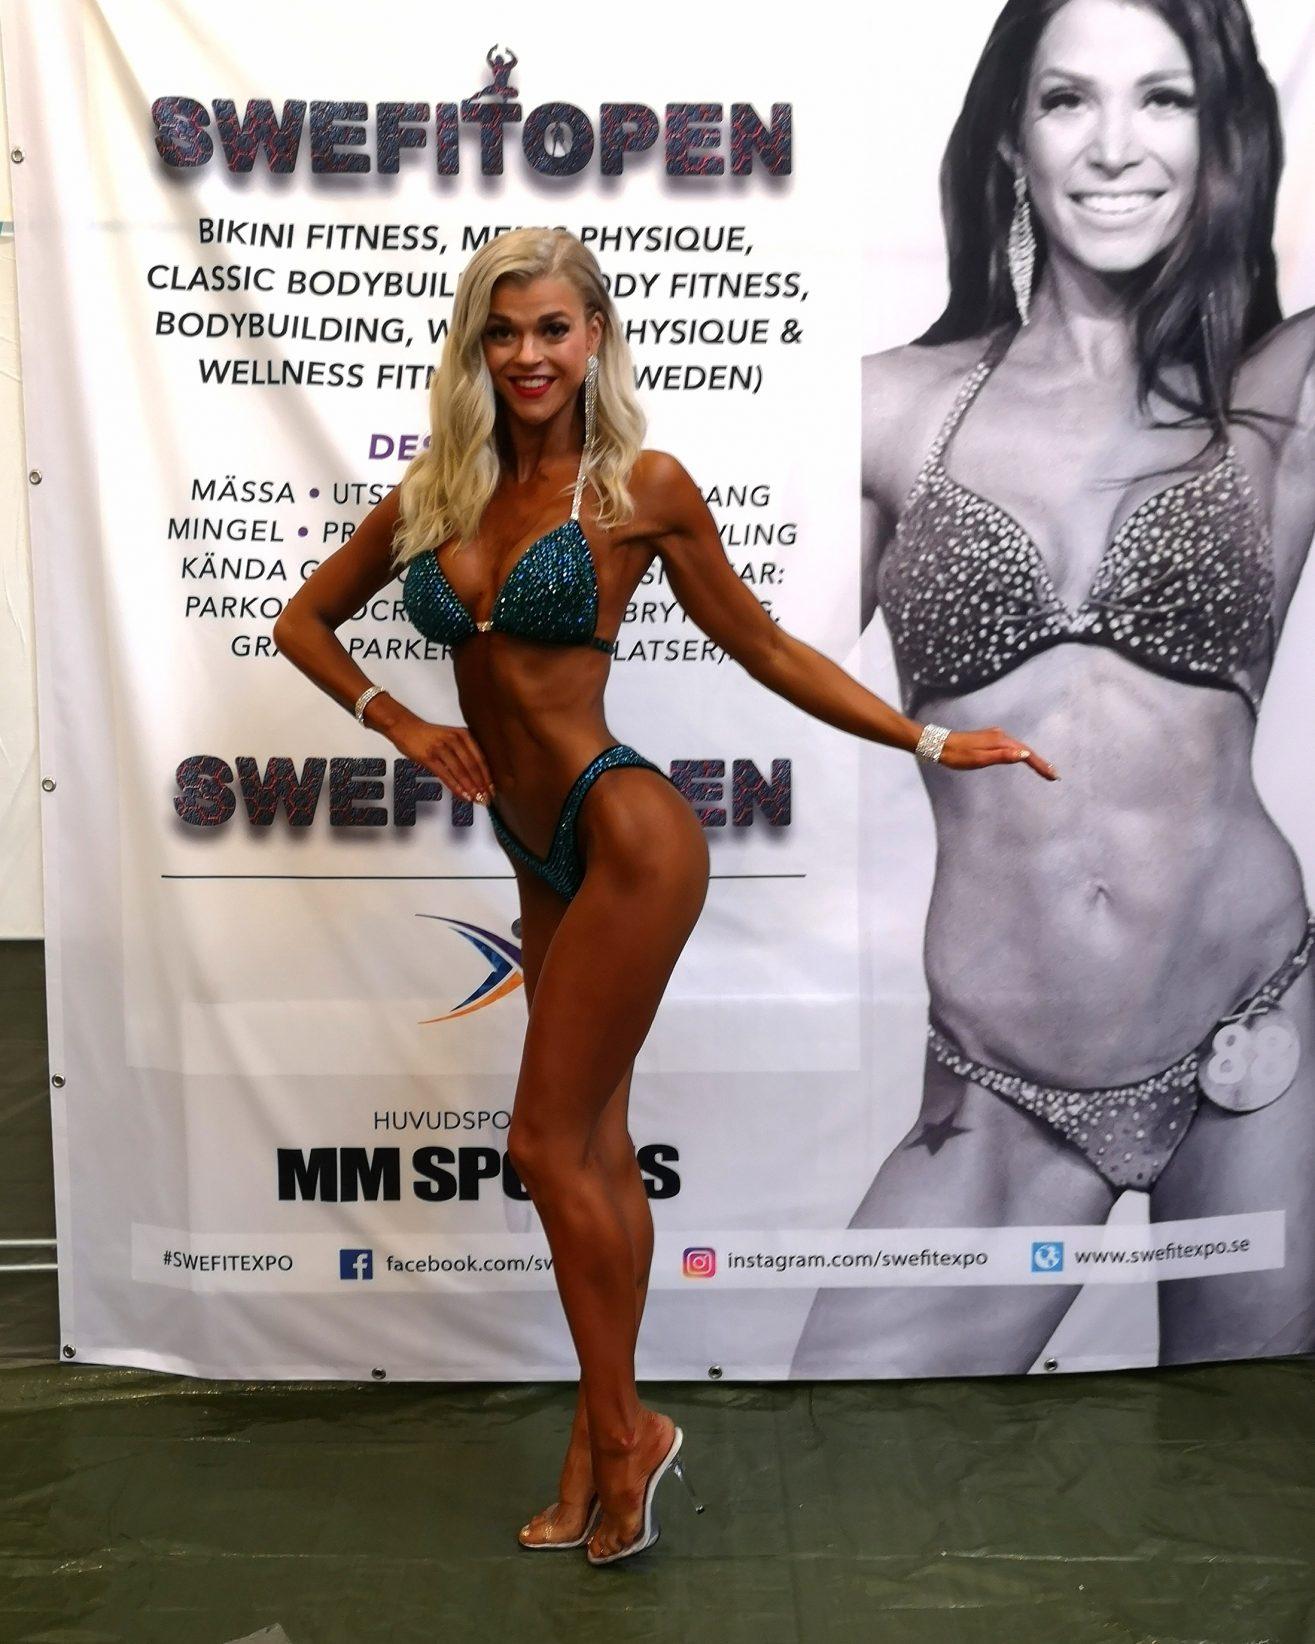 Linn Stenholm Bikinifitness Swefitopen 20181110